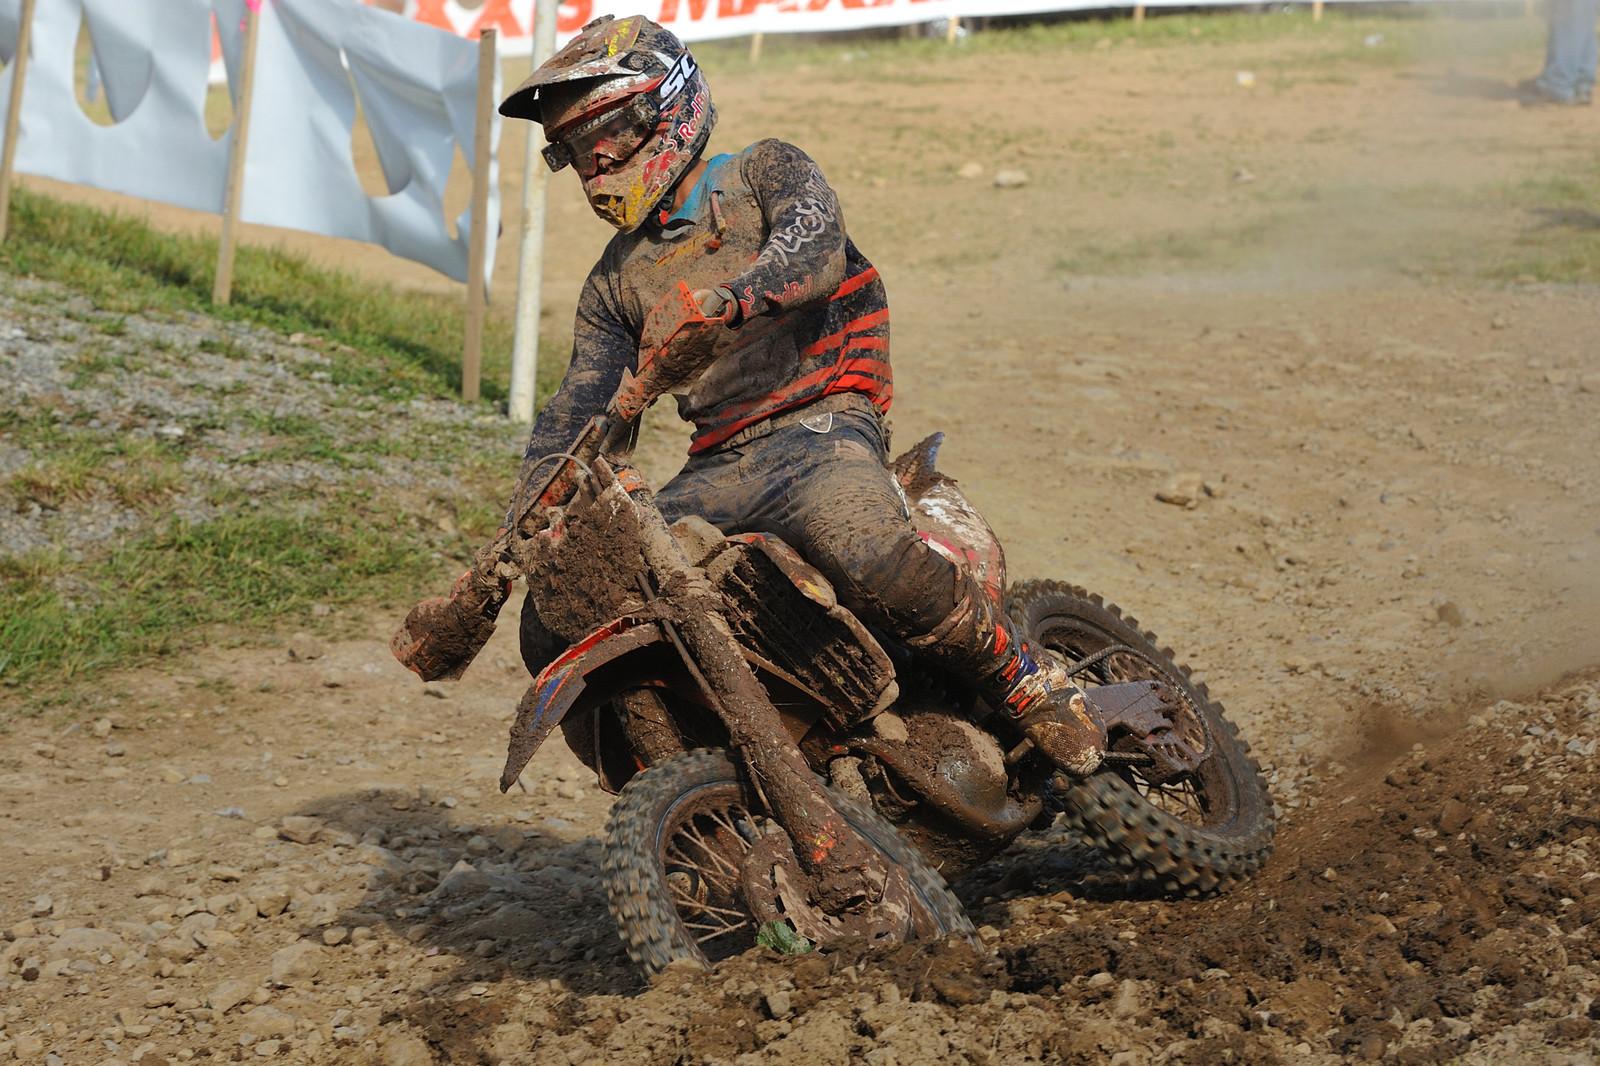 Kailub Russell - Snowshoe GNCC - Motocross Pictures - Vital MX